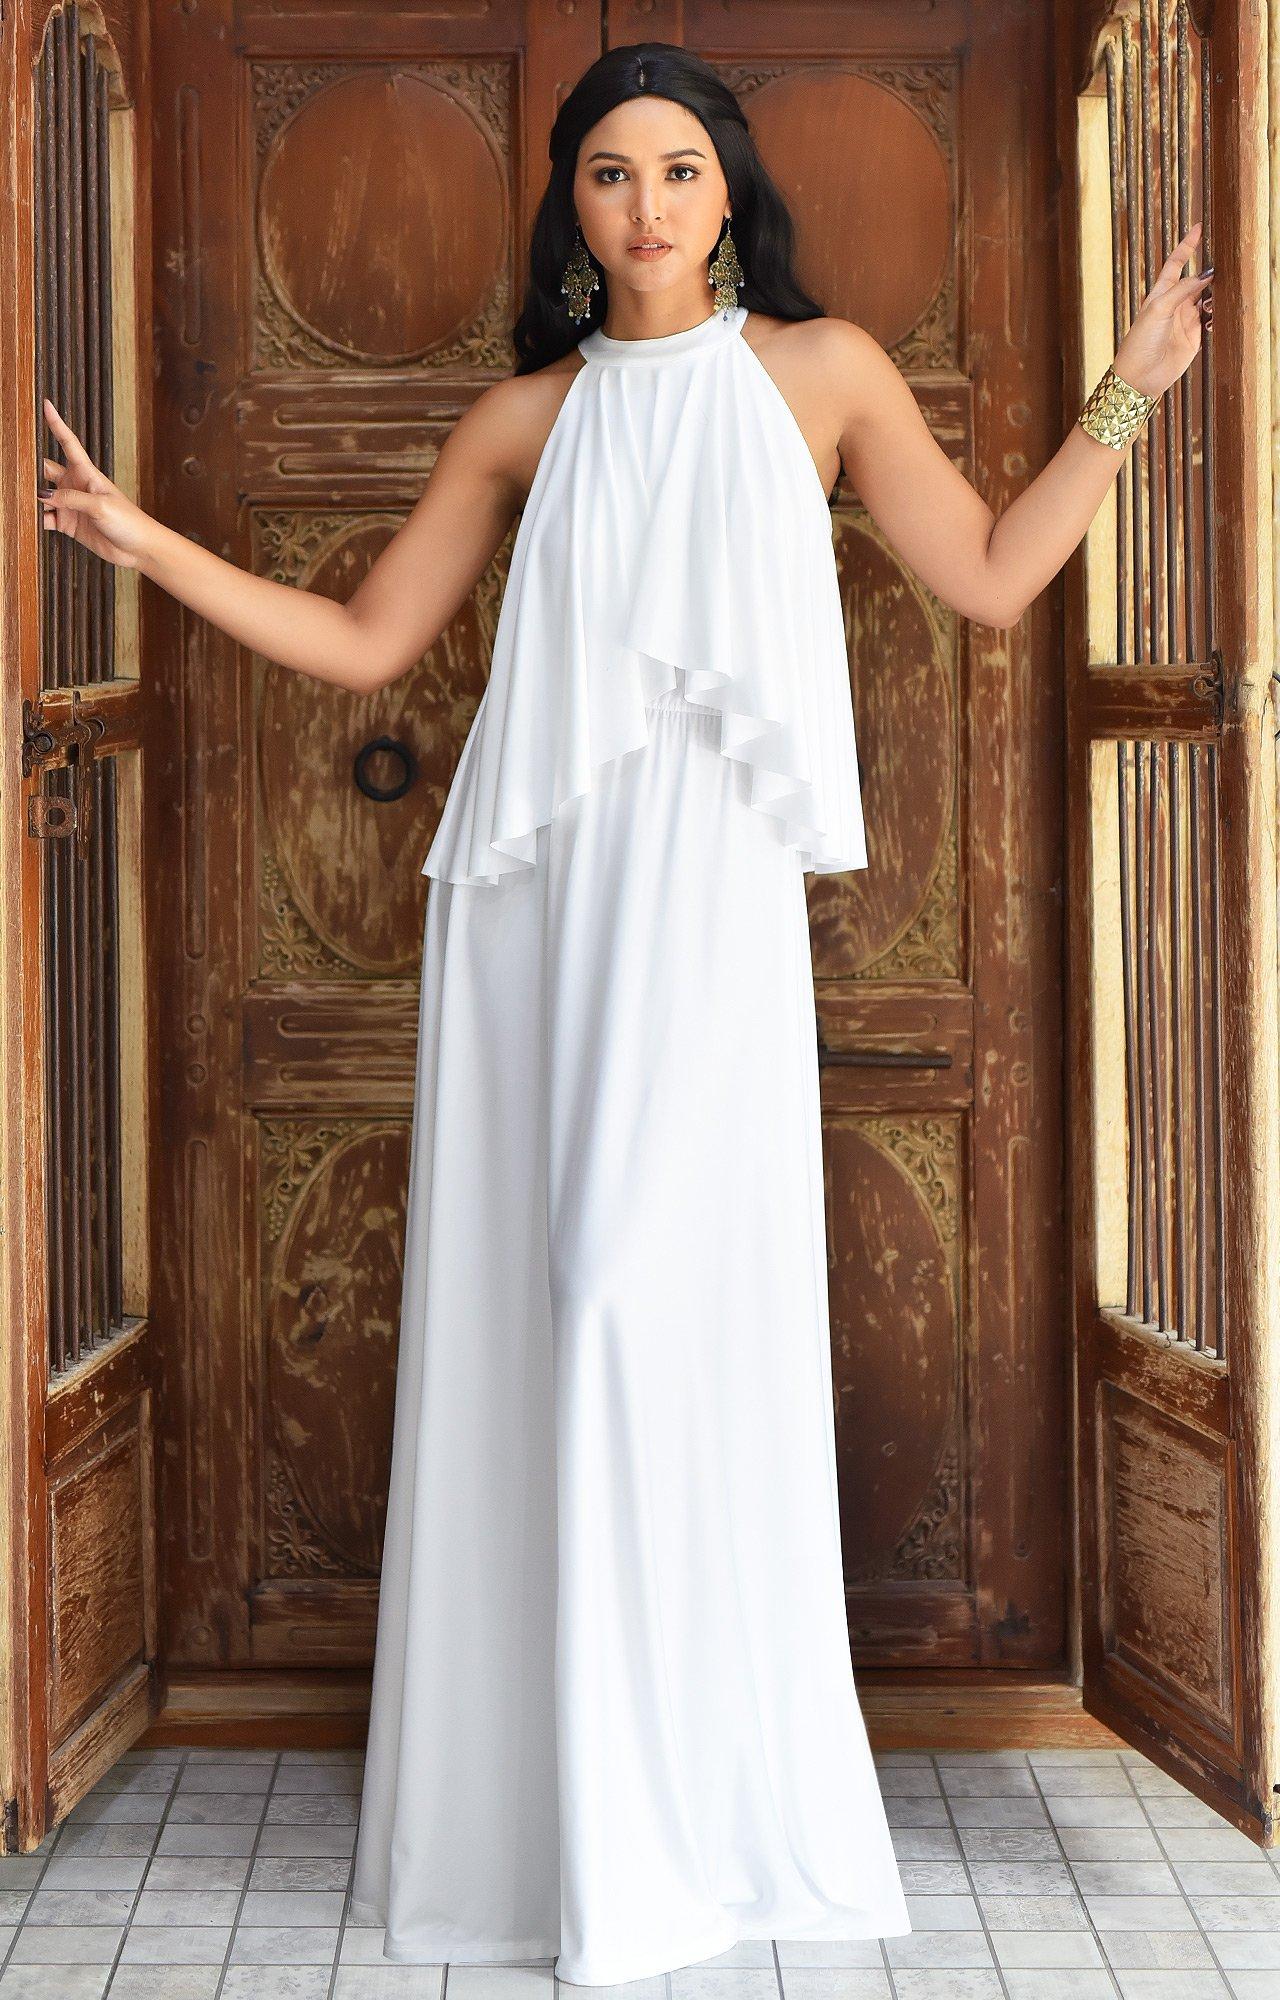 b56b730be62 KOH KOH Petite Womens Long Sleeveless Halter Neck Flowy Bridesmaid ...